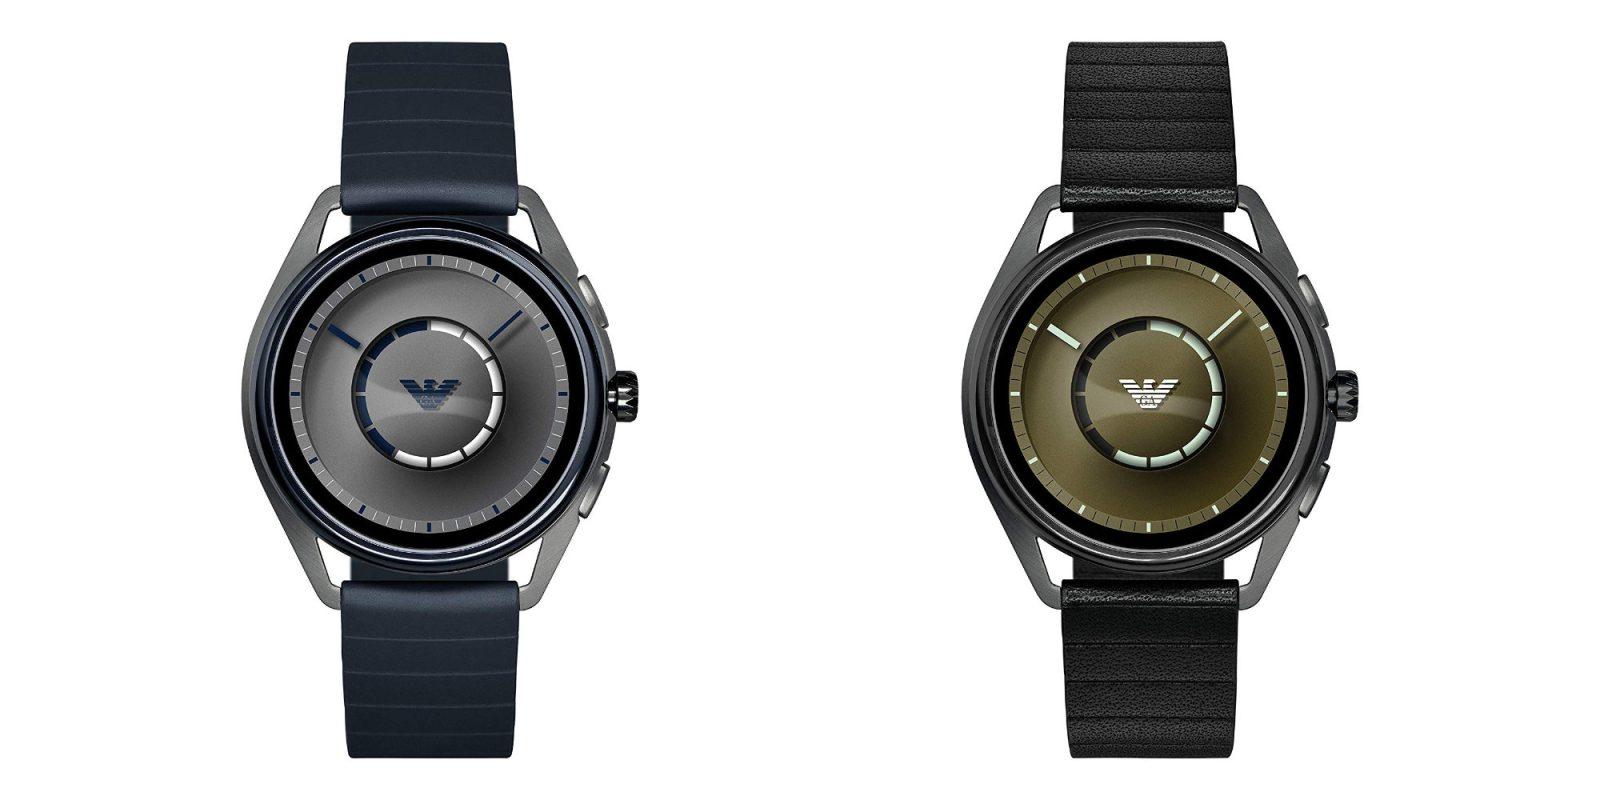 Emporio Armani's fine Italian Wear OS Smartwatch drops to $249 (Reg. $345)